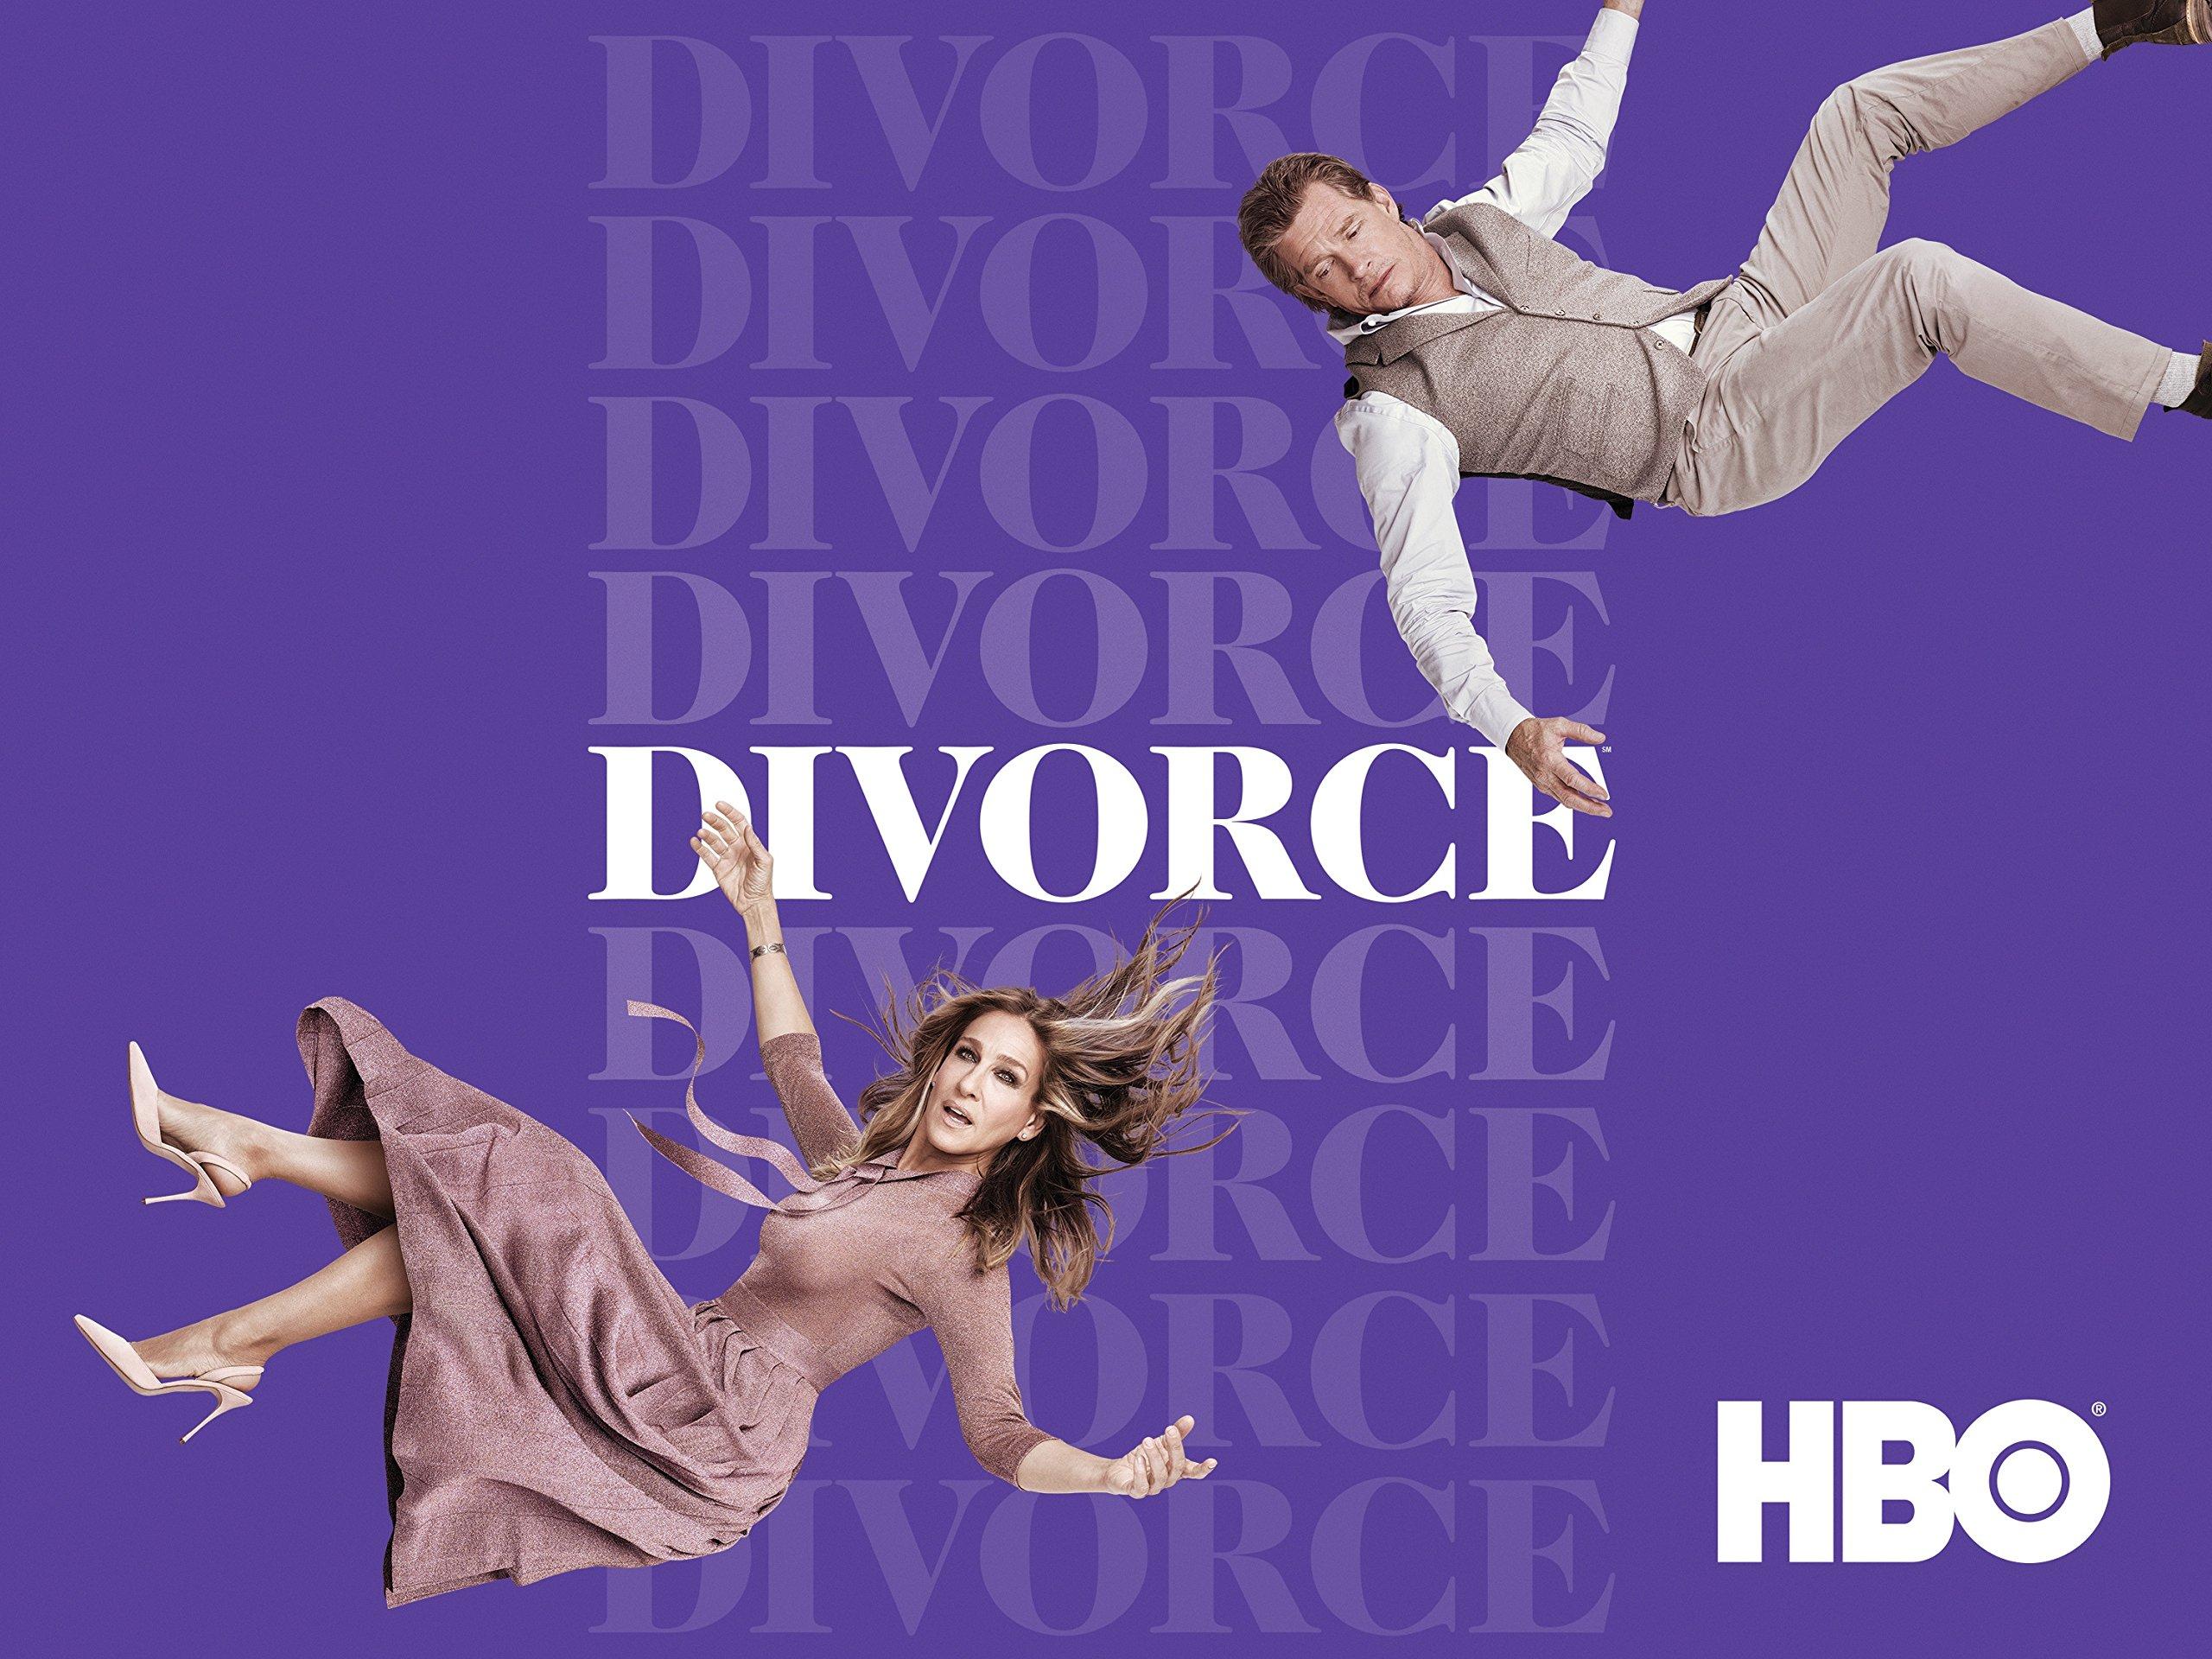 advantages of hookup a divorced man free video 18 2018